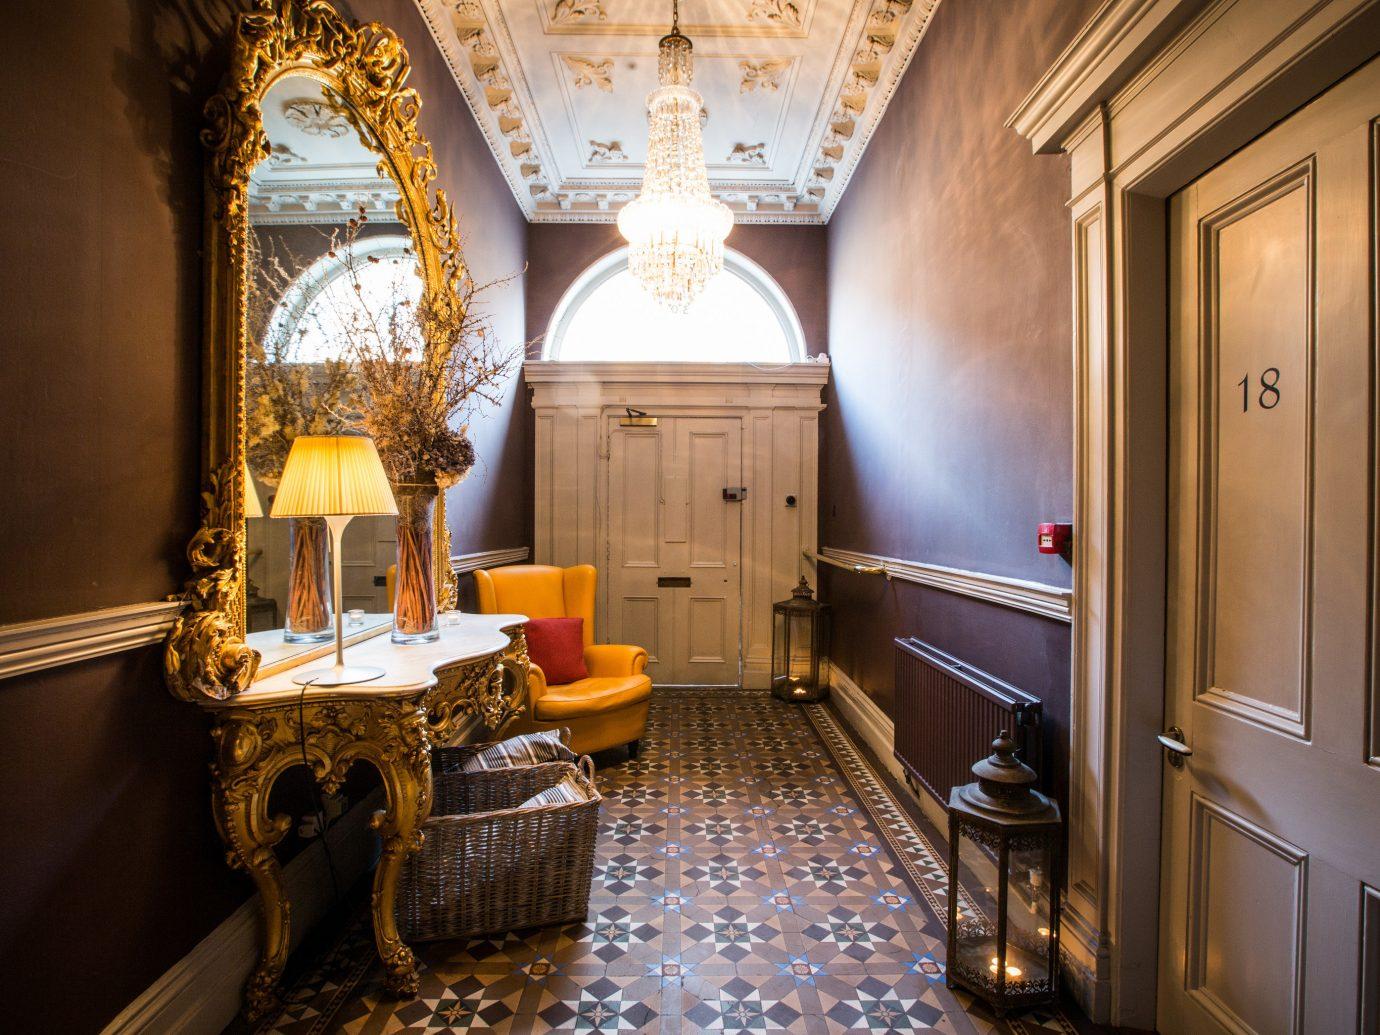 Dublin Hotels Ireland indoor room interior design home ceiling Lobby estate Suite window hall